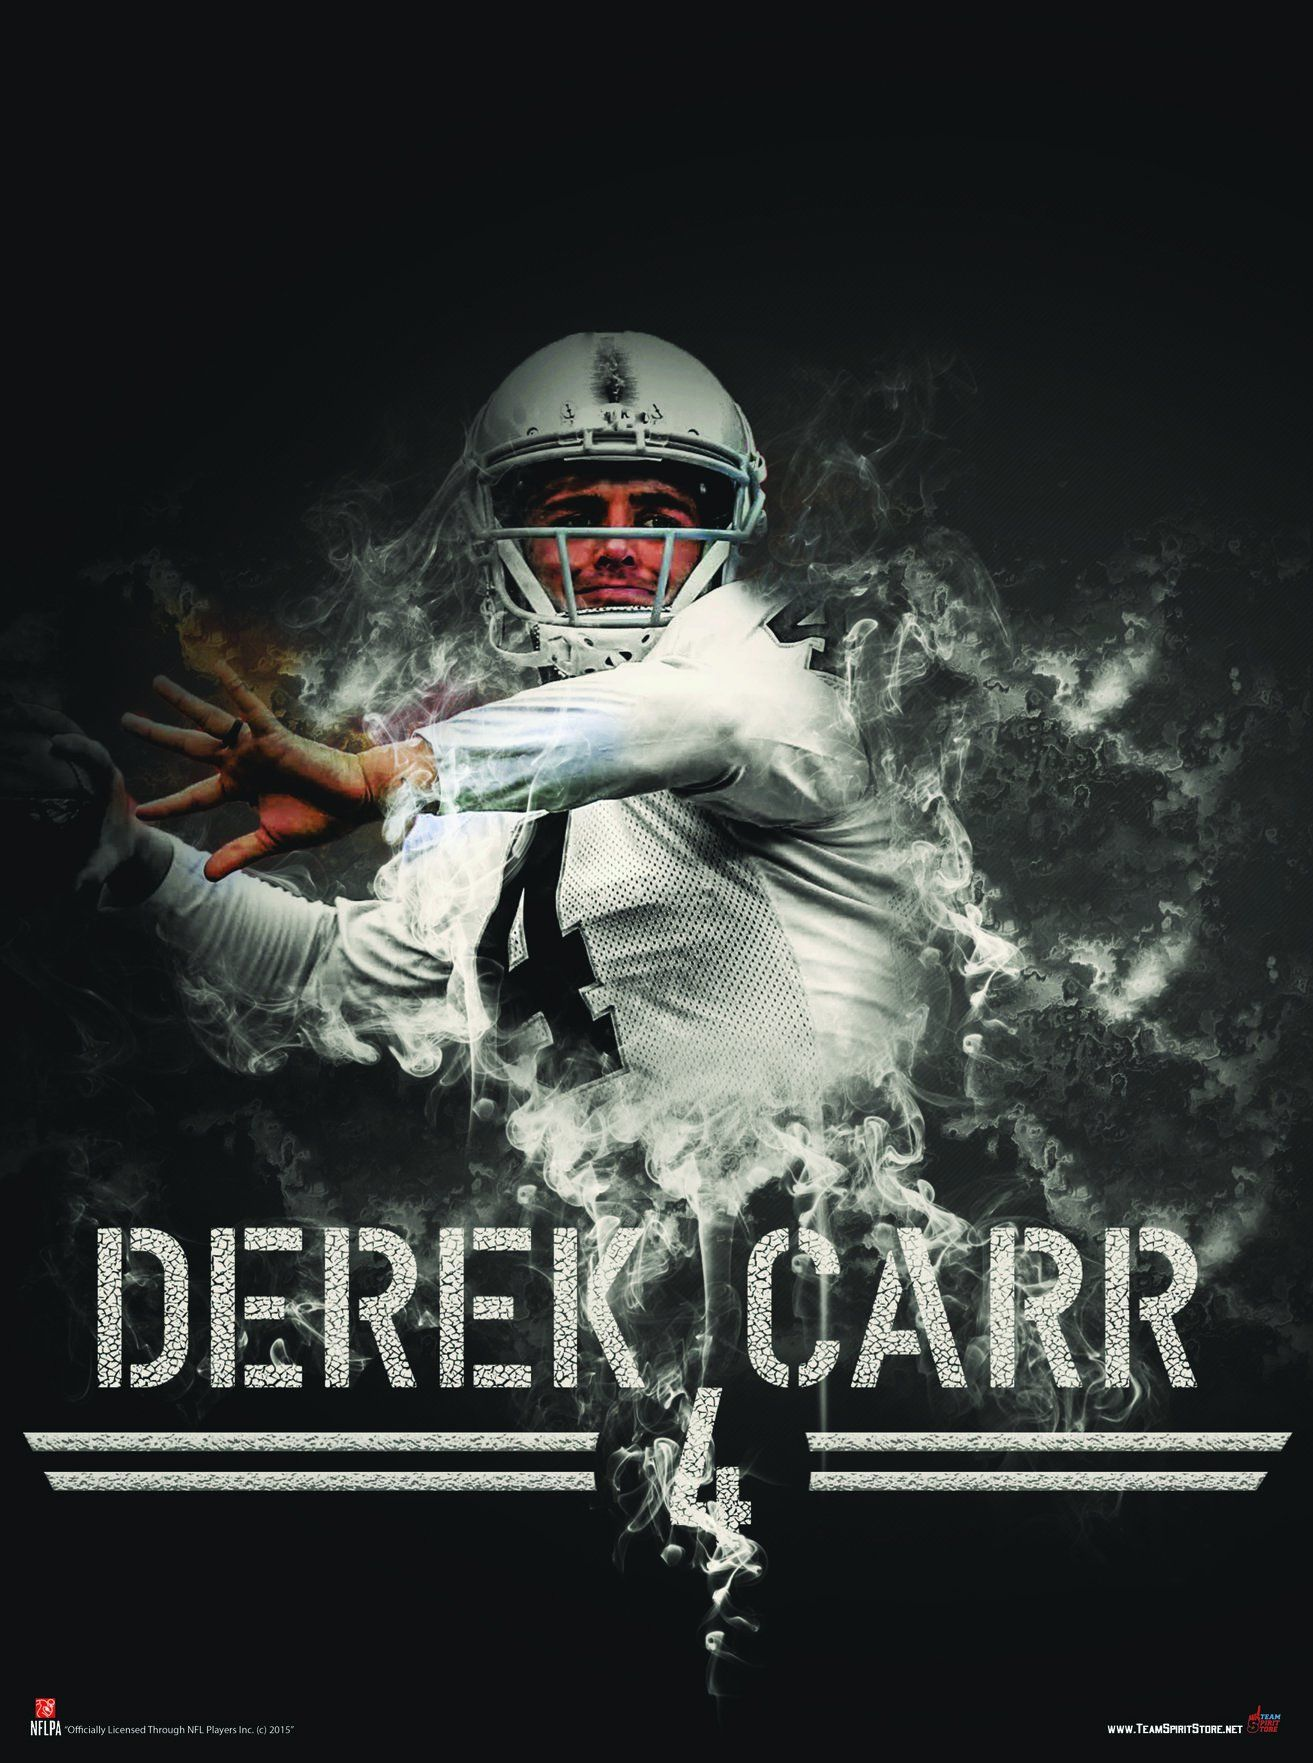 Oakland Raiders Derek Carr Silver Slinger 24x18 Football Poster ... 4a8c12534c307